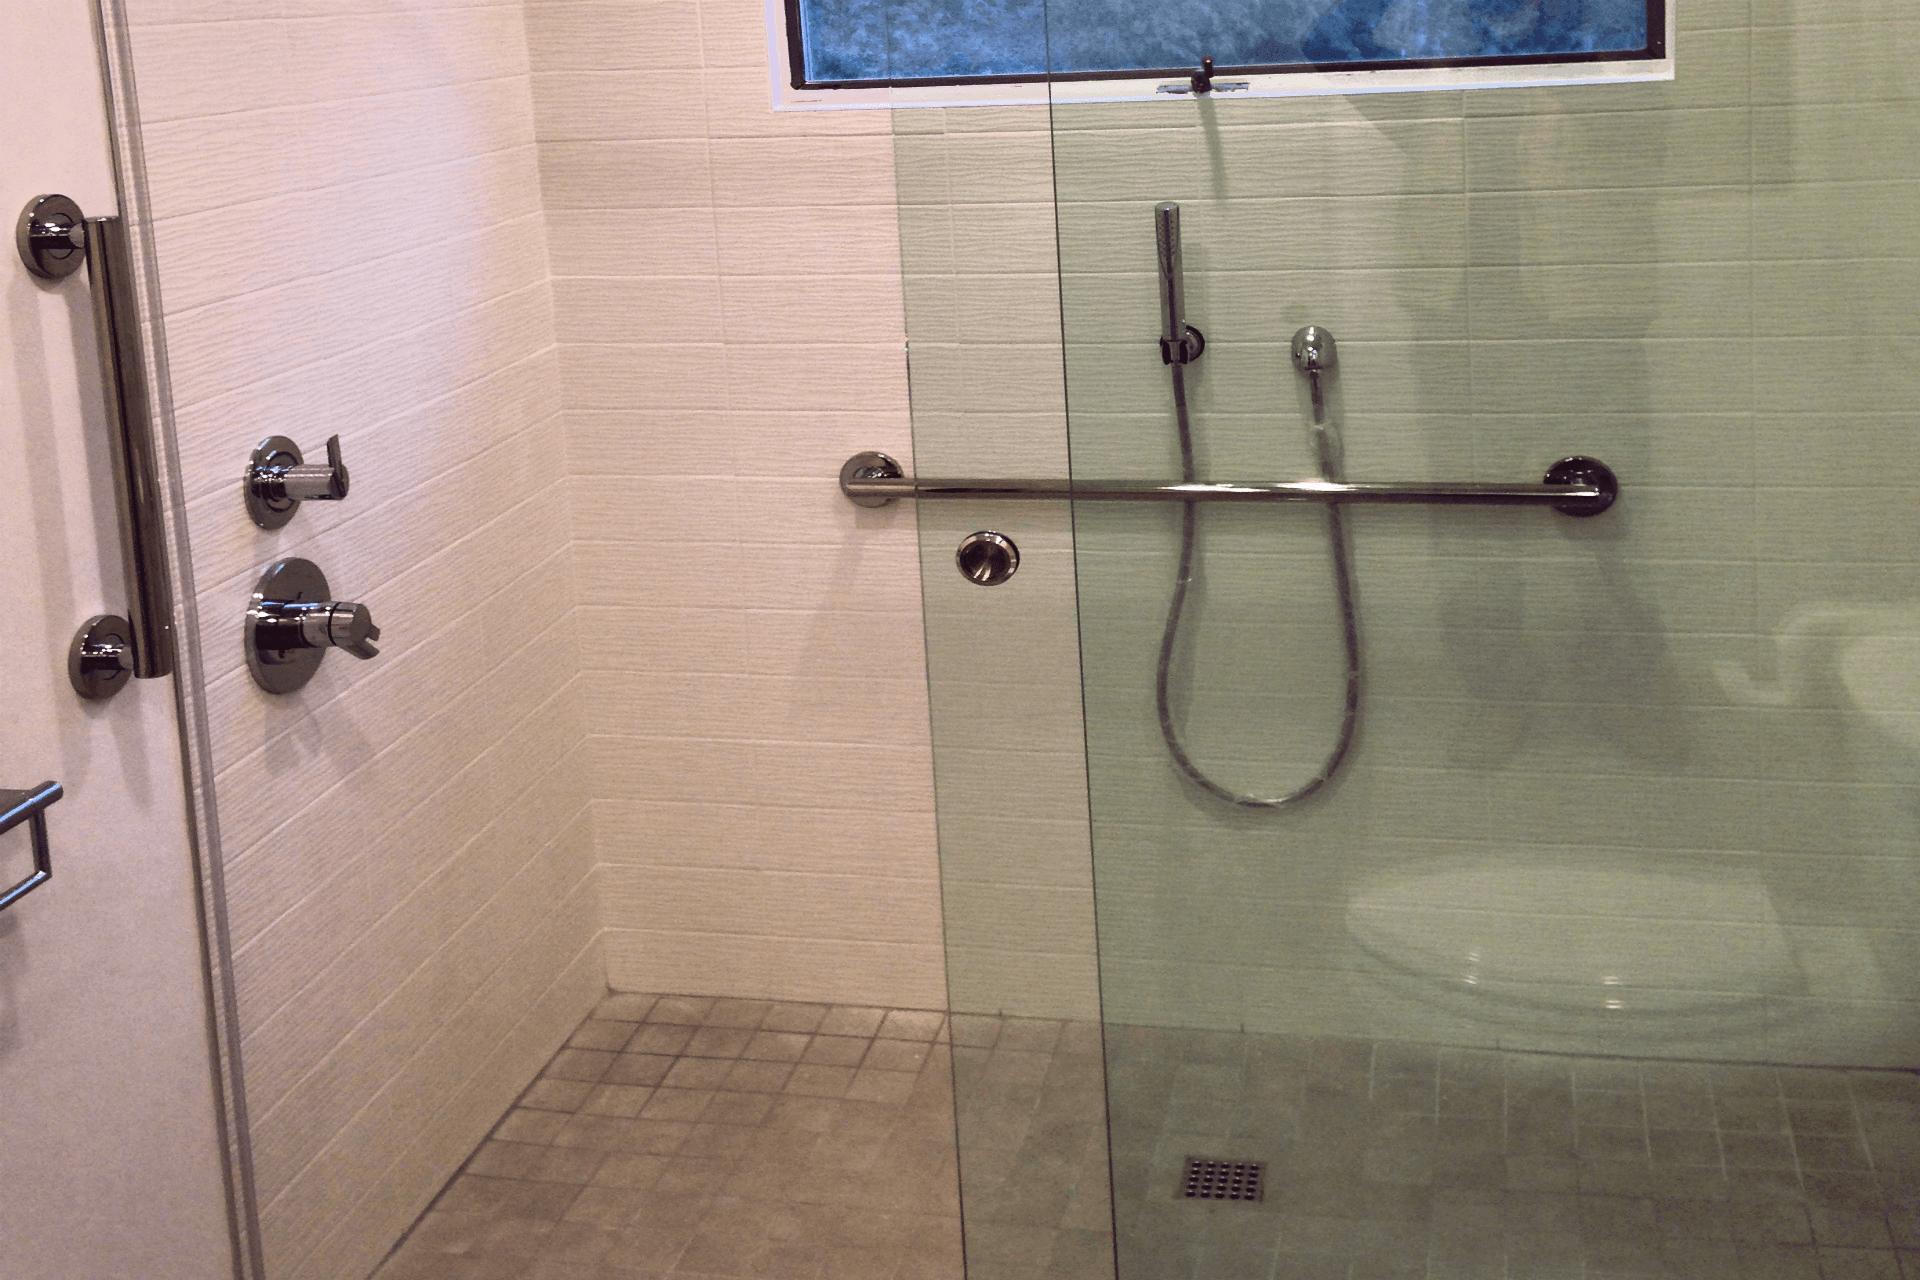 blueridge conversion convert jasper ellijay to handicap or img tub shower blairesville